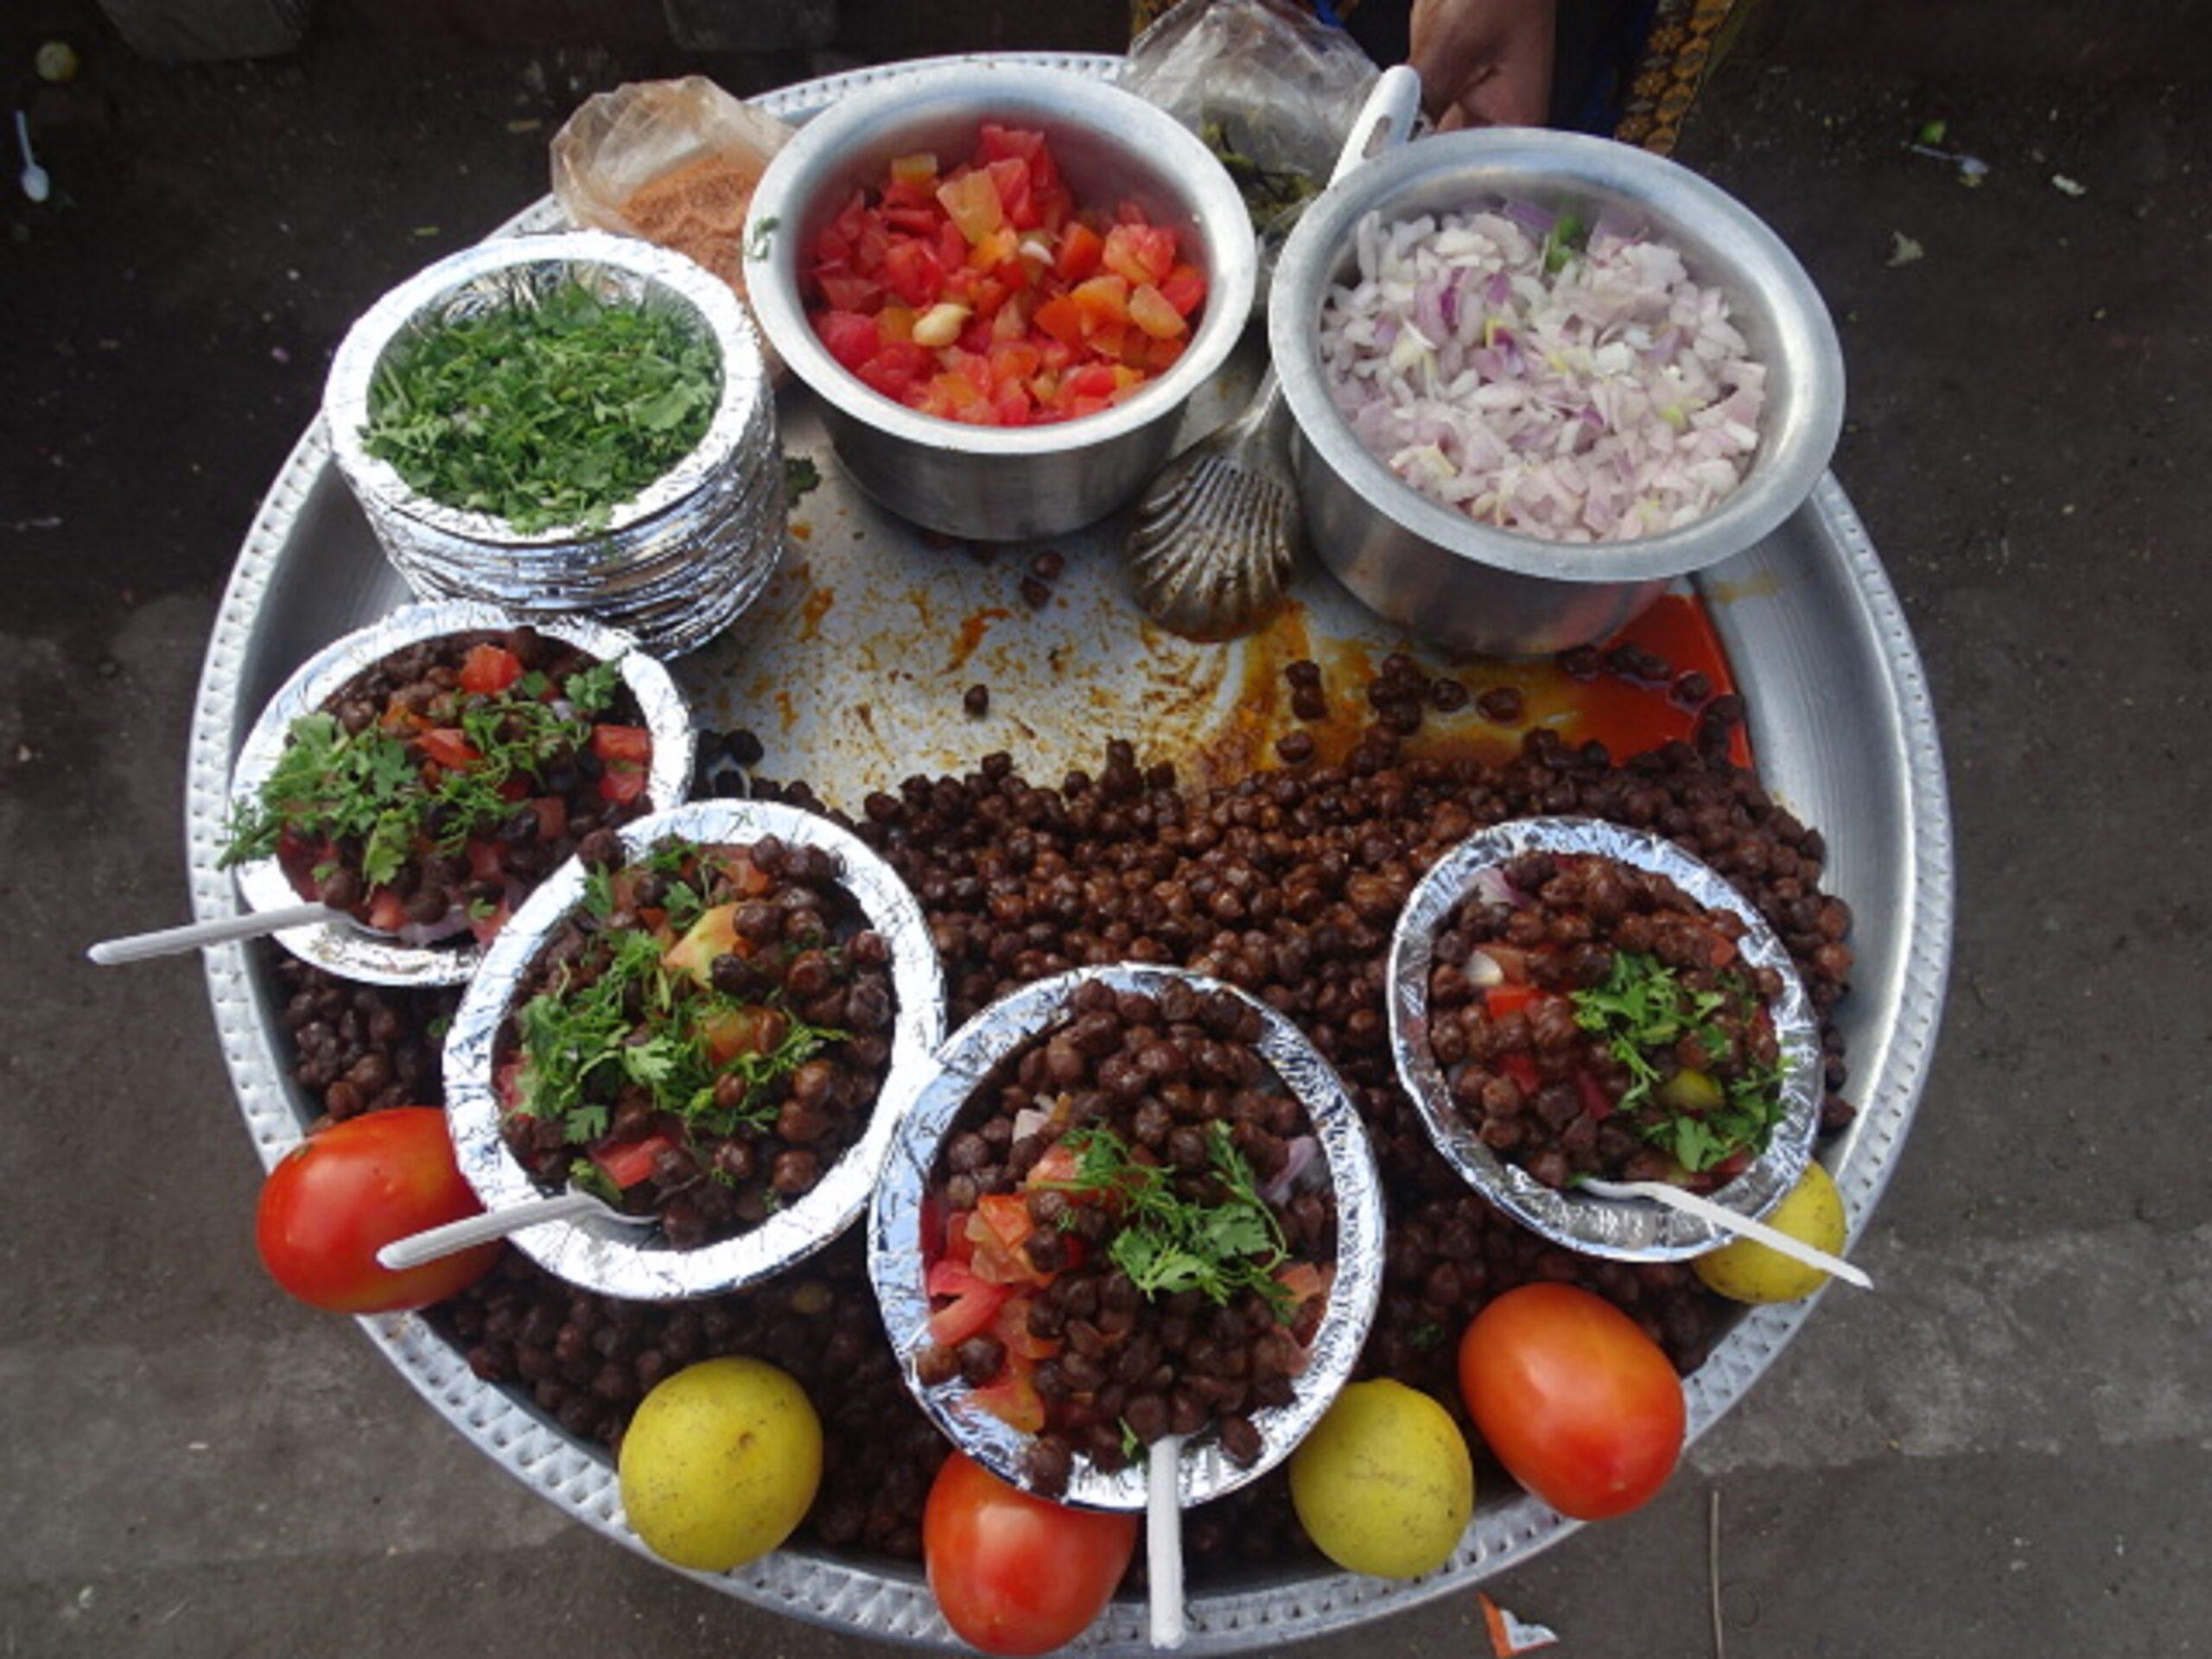 Kala Chana Chat - Dry Black Chickpeas Chaat at Shirdi, Maharashtra